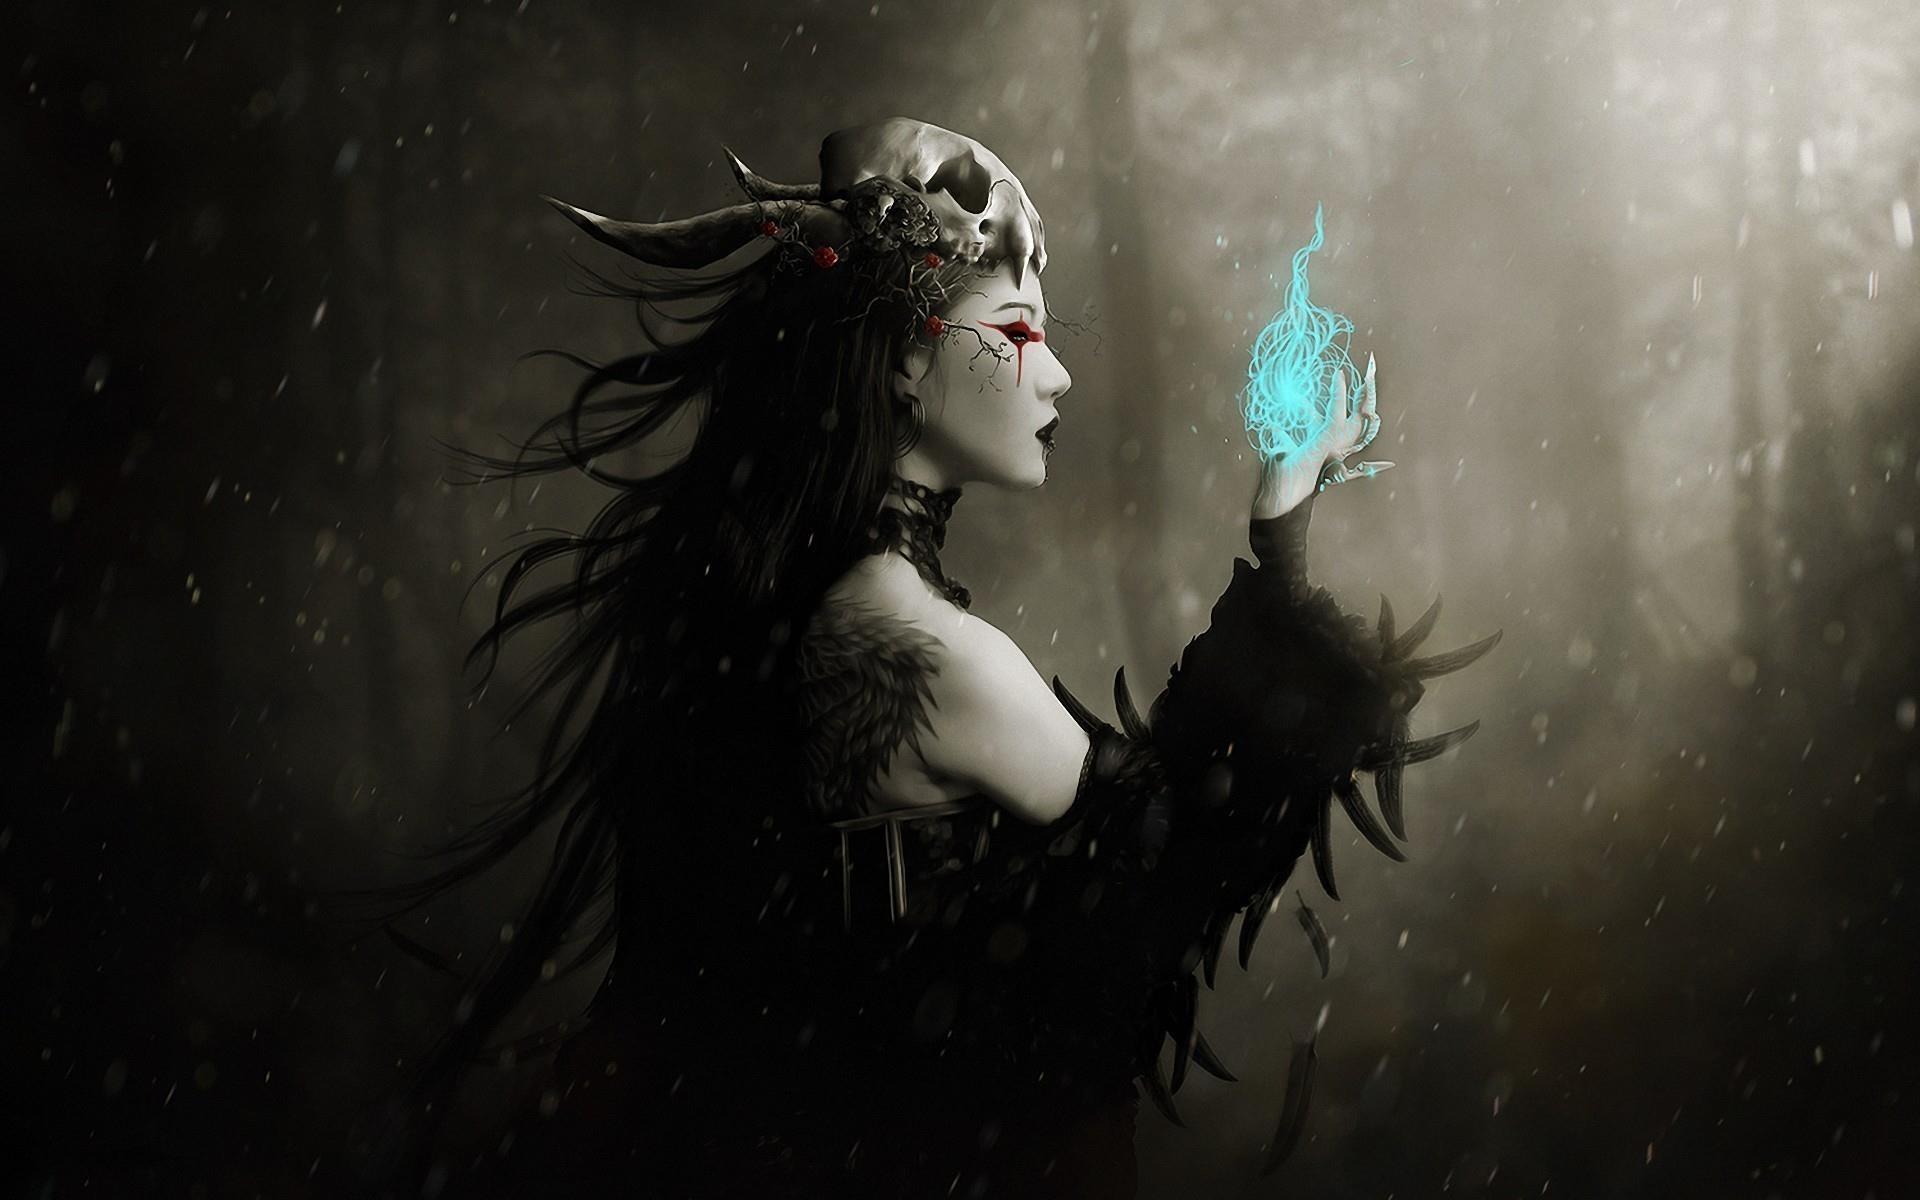 General 1920x1200 magic fantasy art fantasy girl dark fantasy skull women dark artwork snowing pale cyan